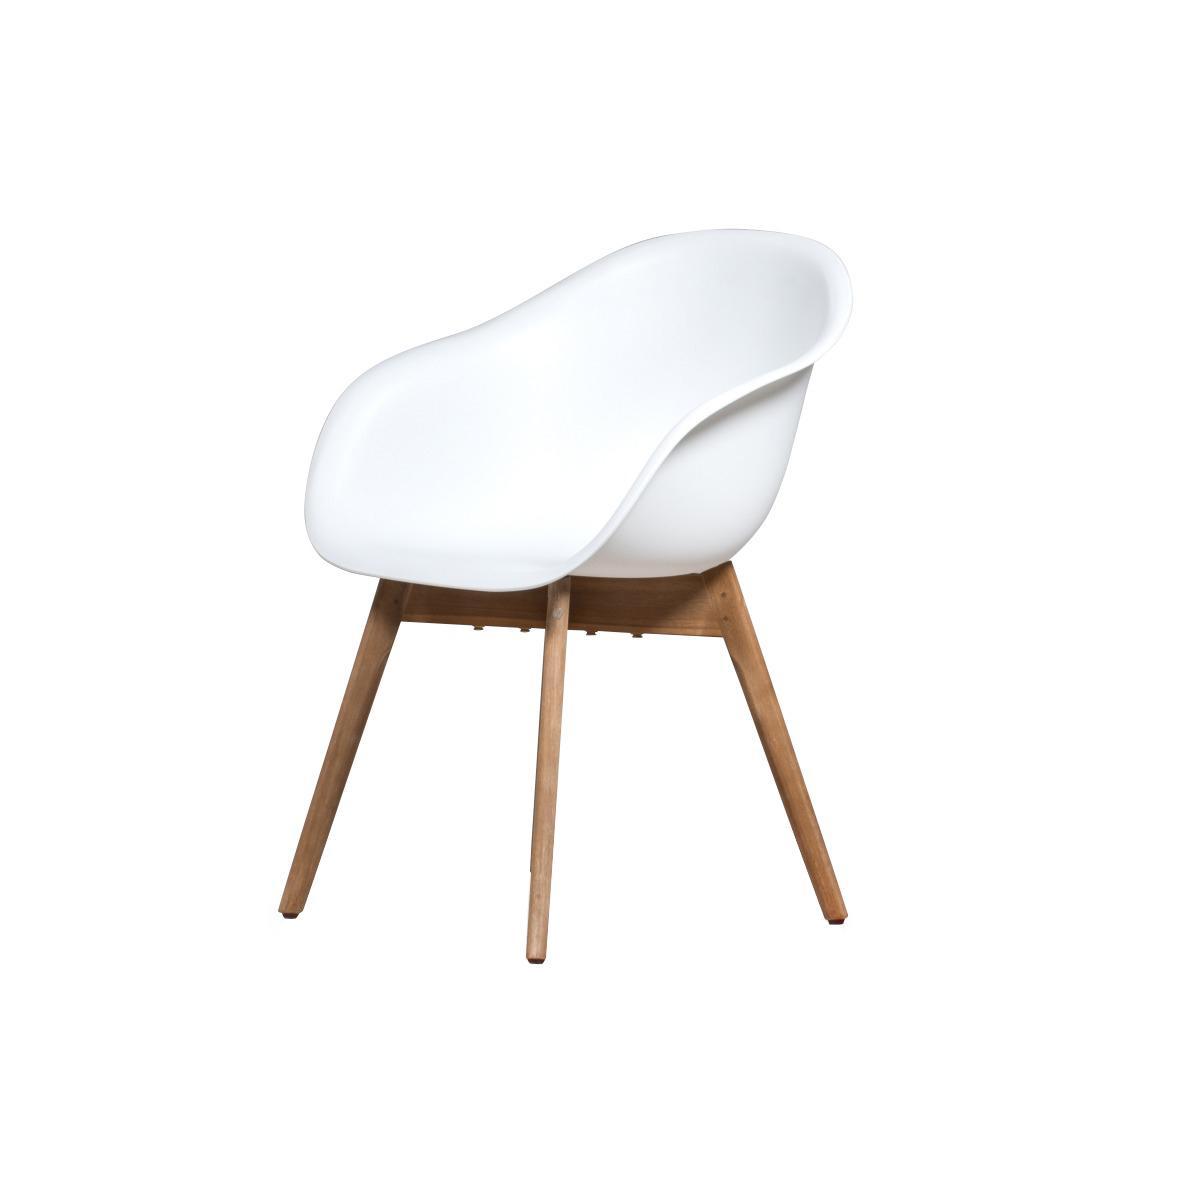 Fredrikstad dining chair (1263)